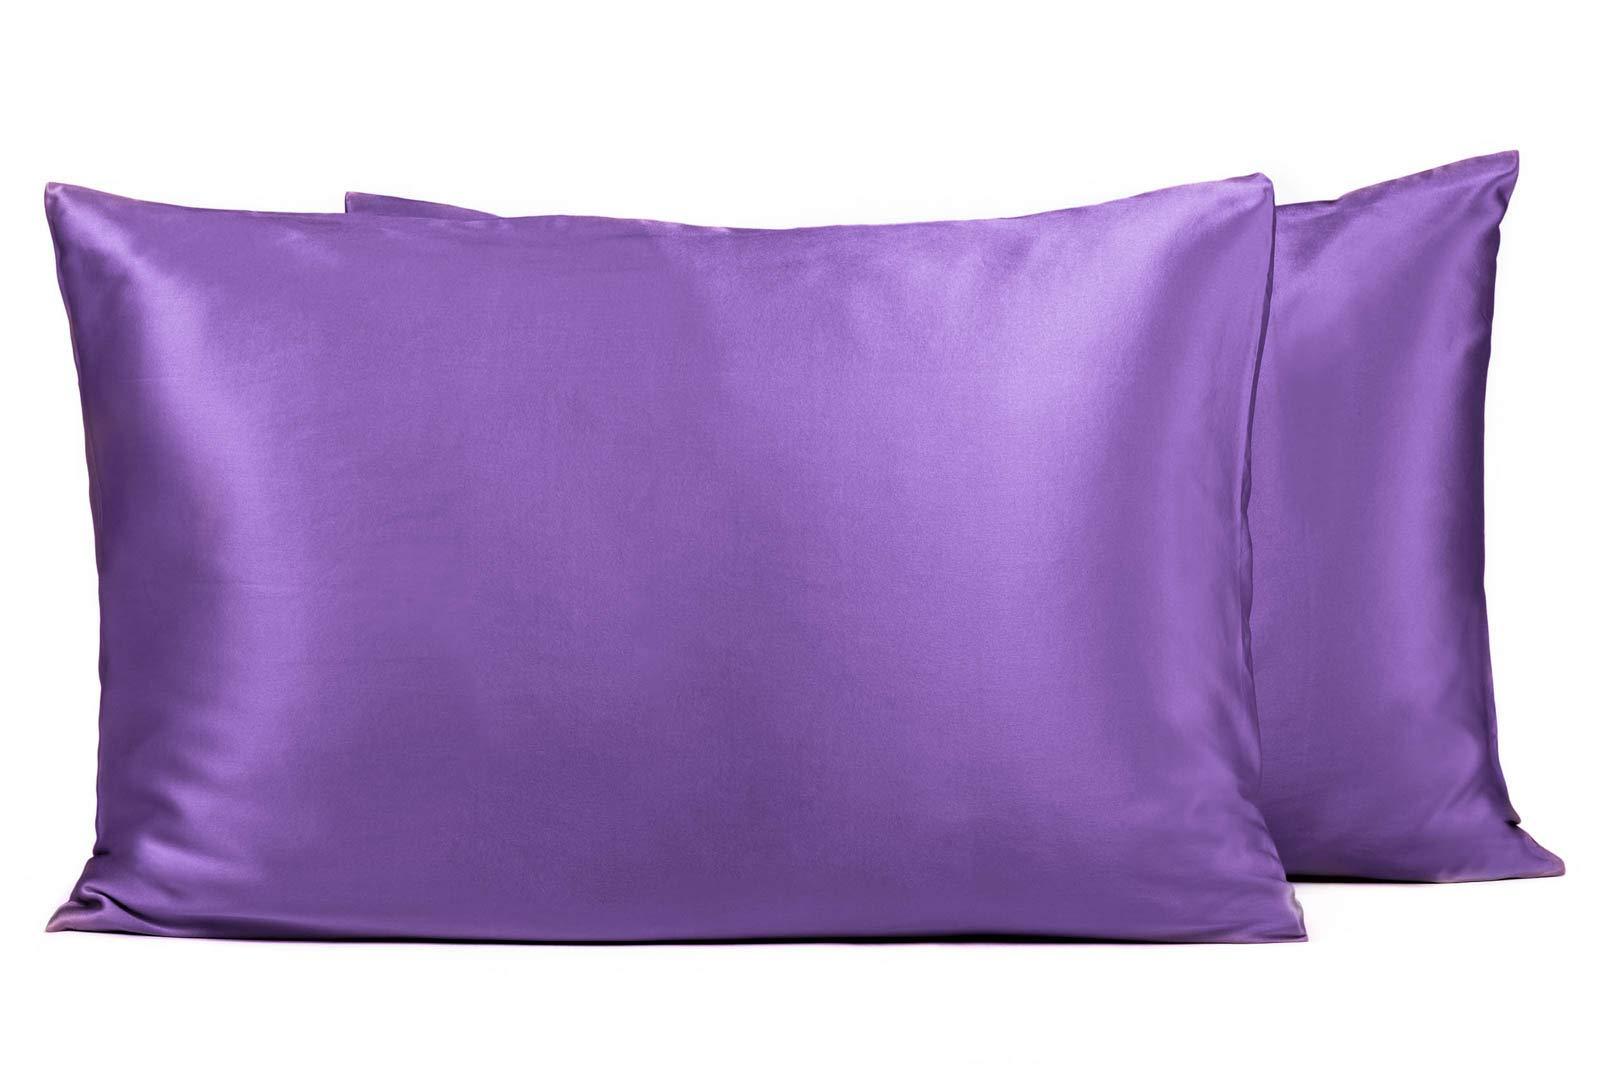 Fishers Finery25mm Mulberry Silk QueenPillowcase, Good Housekeeping Winner (Deep Lavender, Queen 2 Pack)